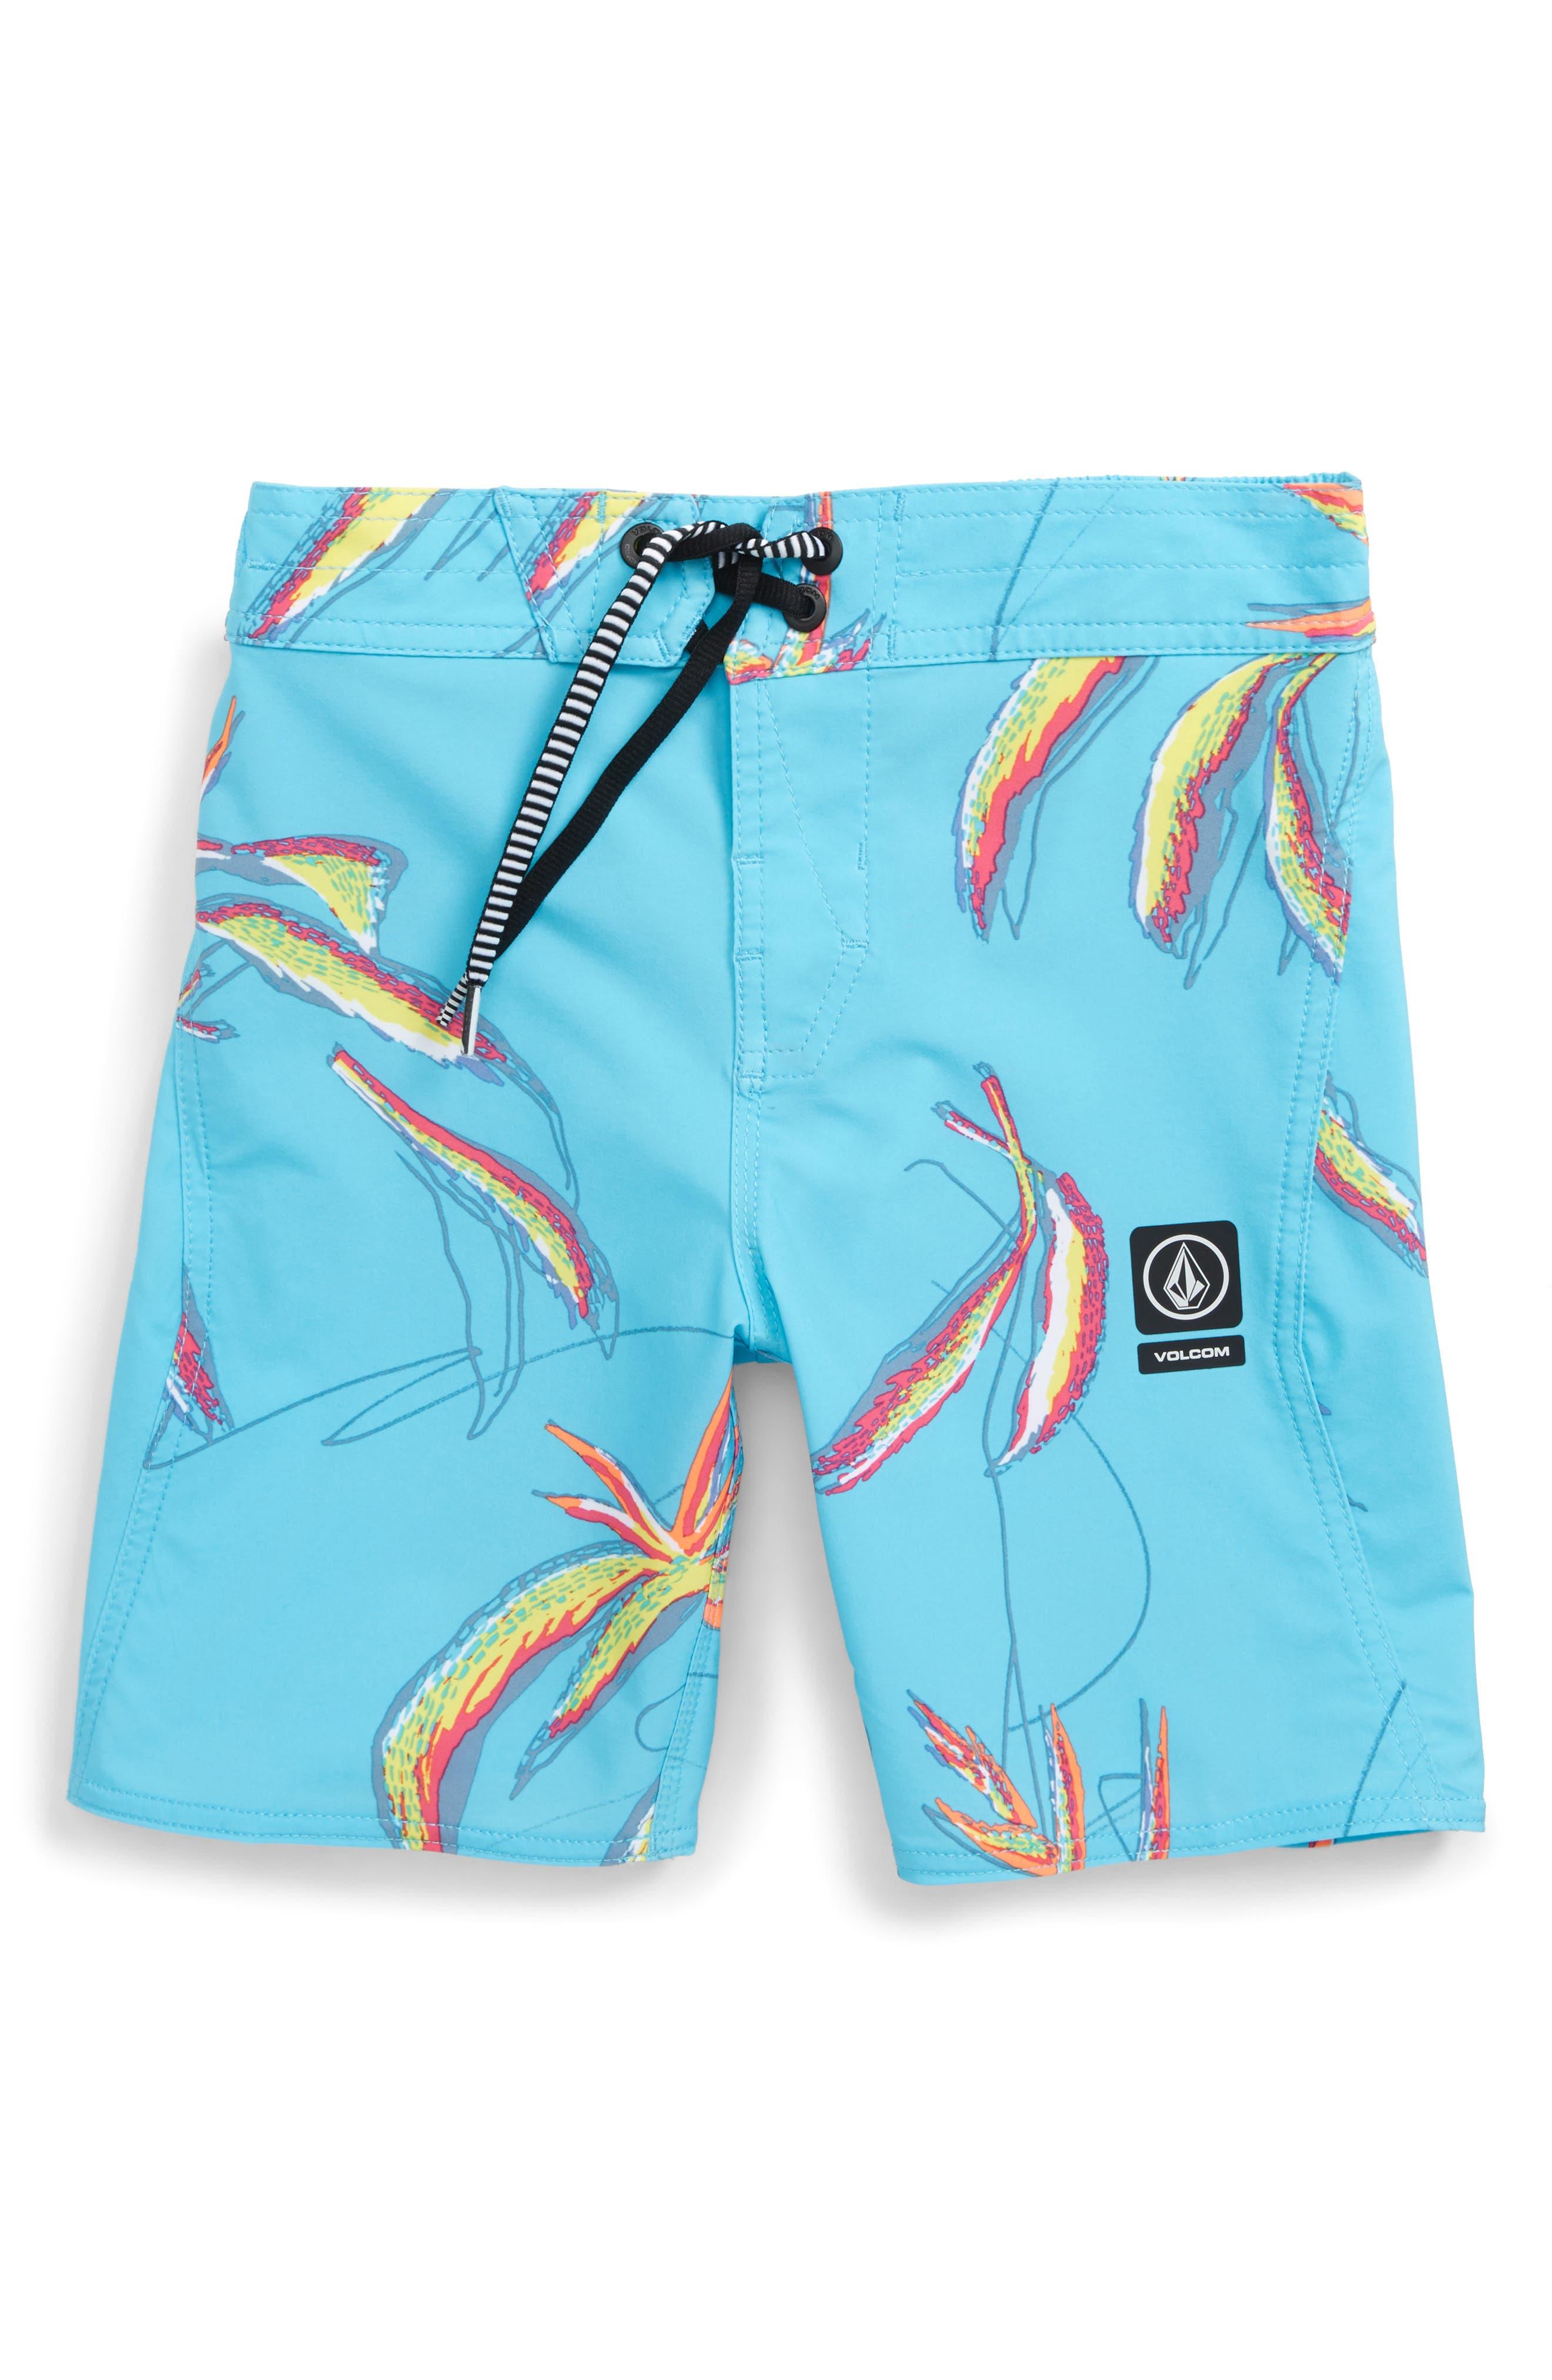 Main Image - Volcom Tropical Print Board Shorts (Big Boys)